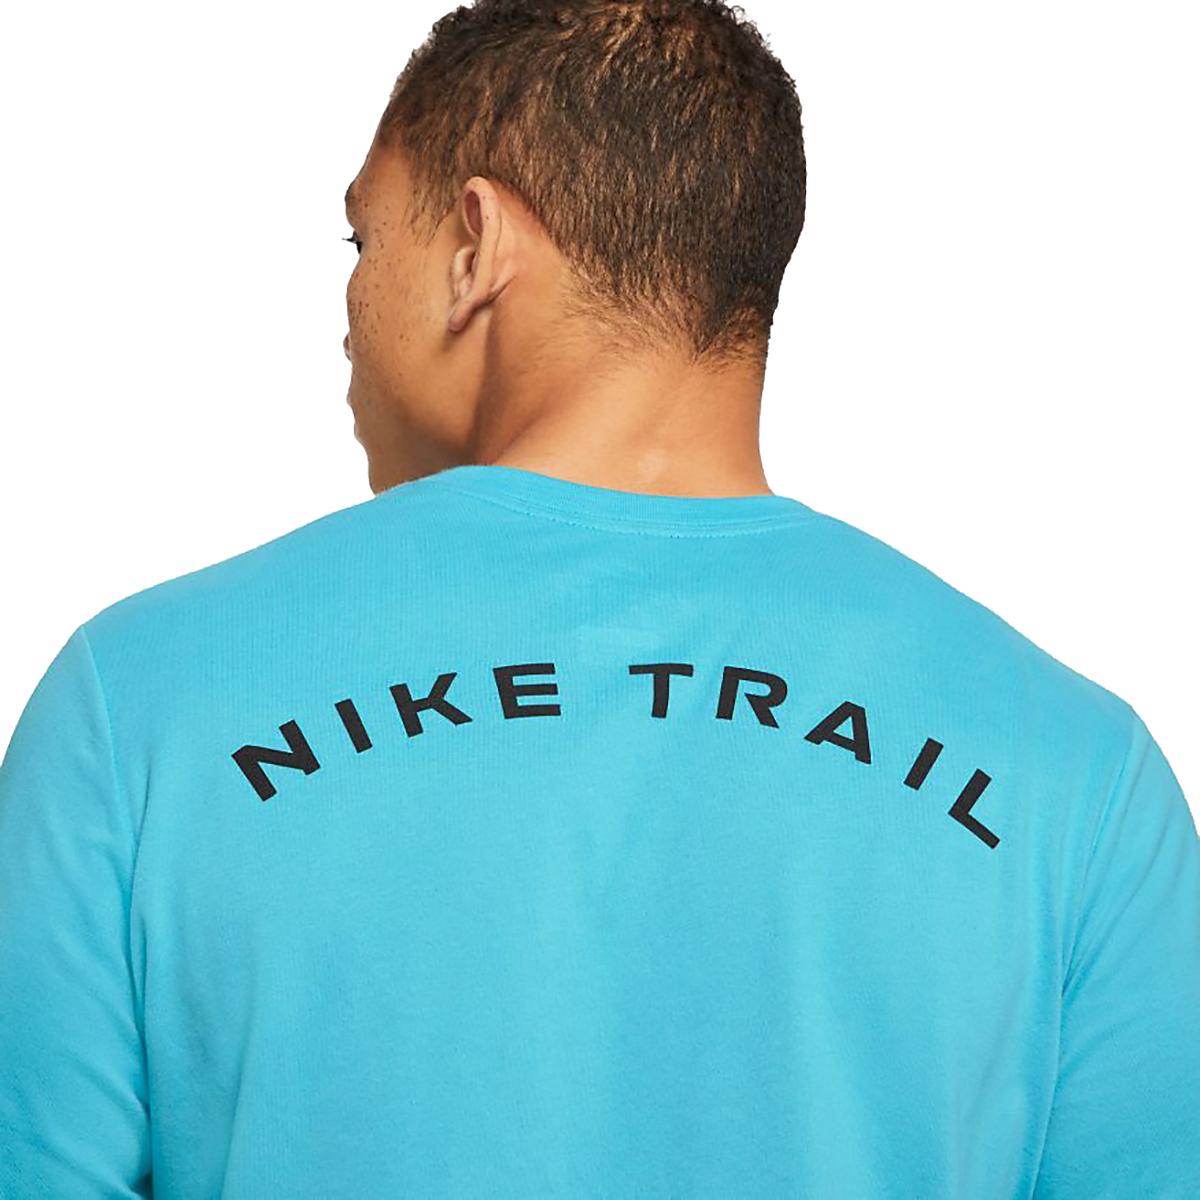 Men's Nike Dri-FIT Long-Sleeve Trail Running T-Shirt, , large, image 4